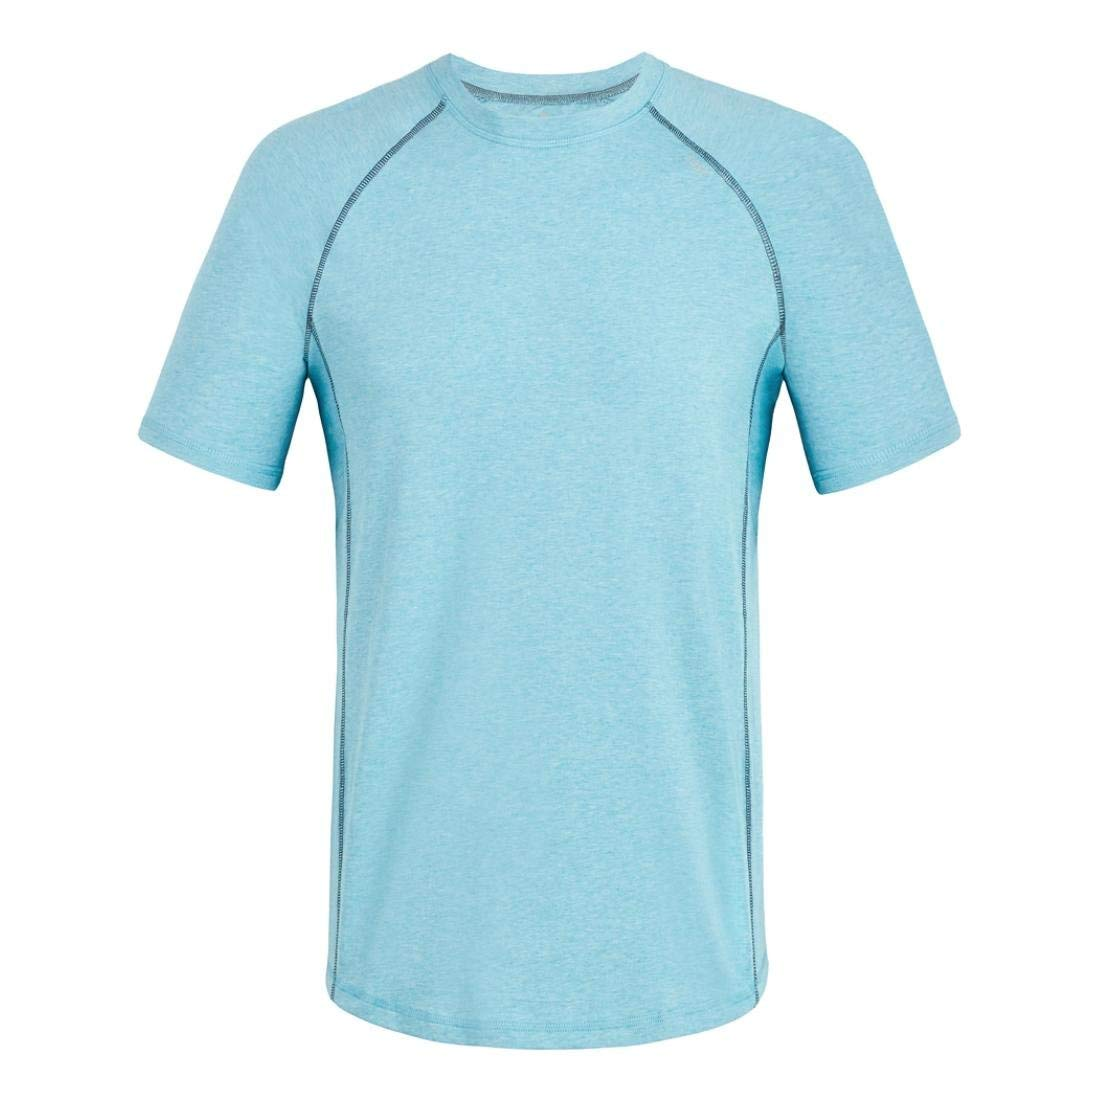 tasc Performance Charge short sleeve T-Shirt, Barracuda, Small